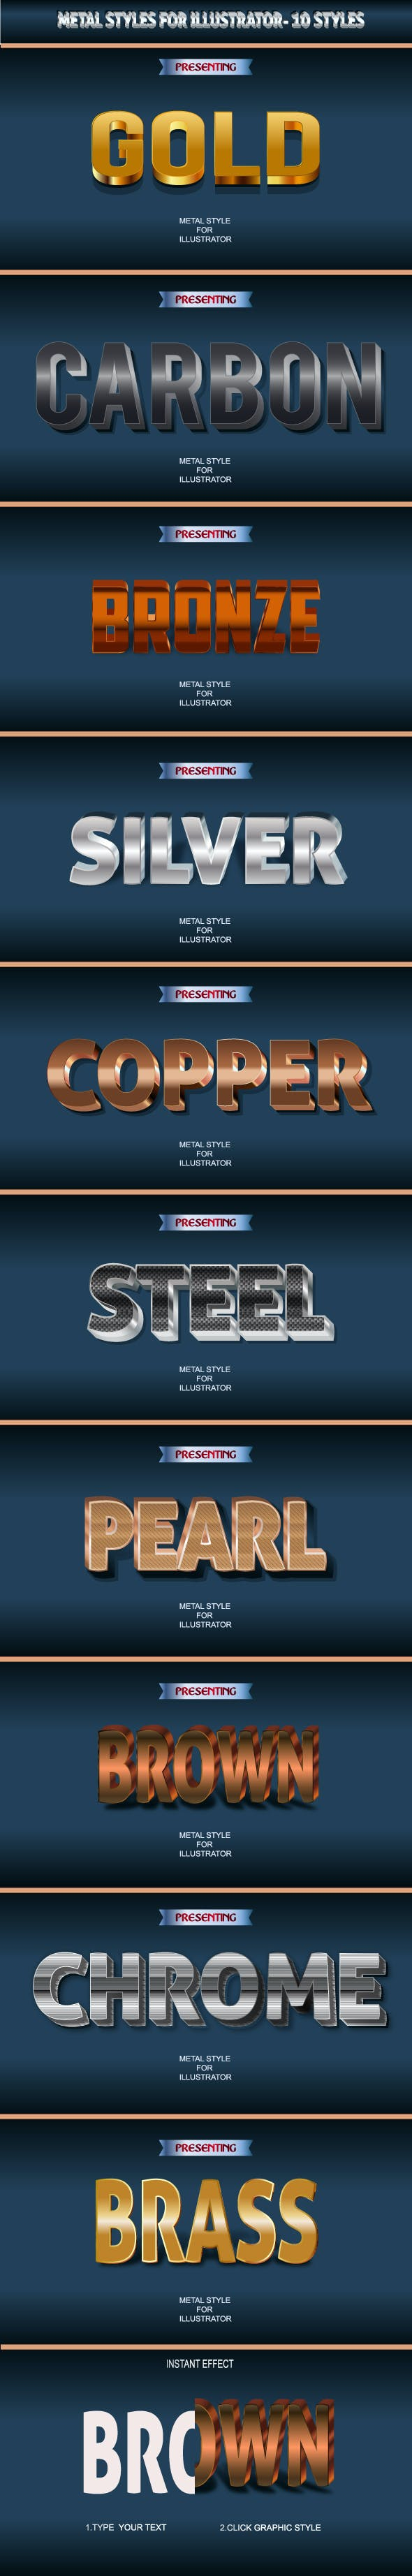 Metallic Graphic Styles for Illustrator